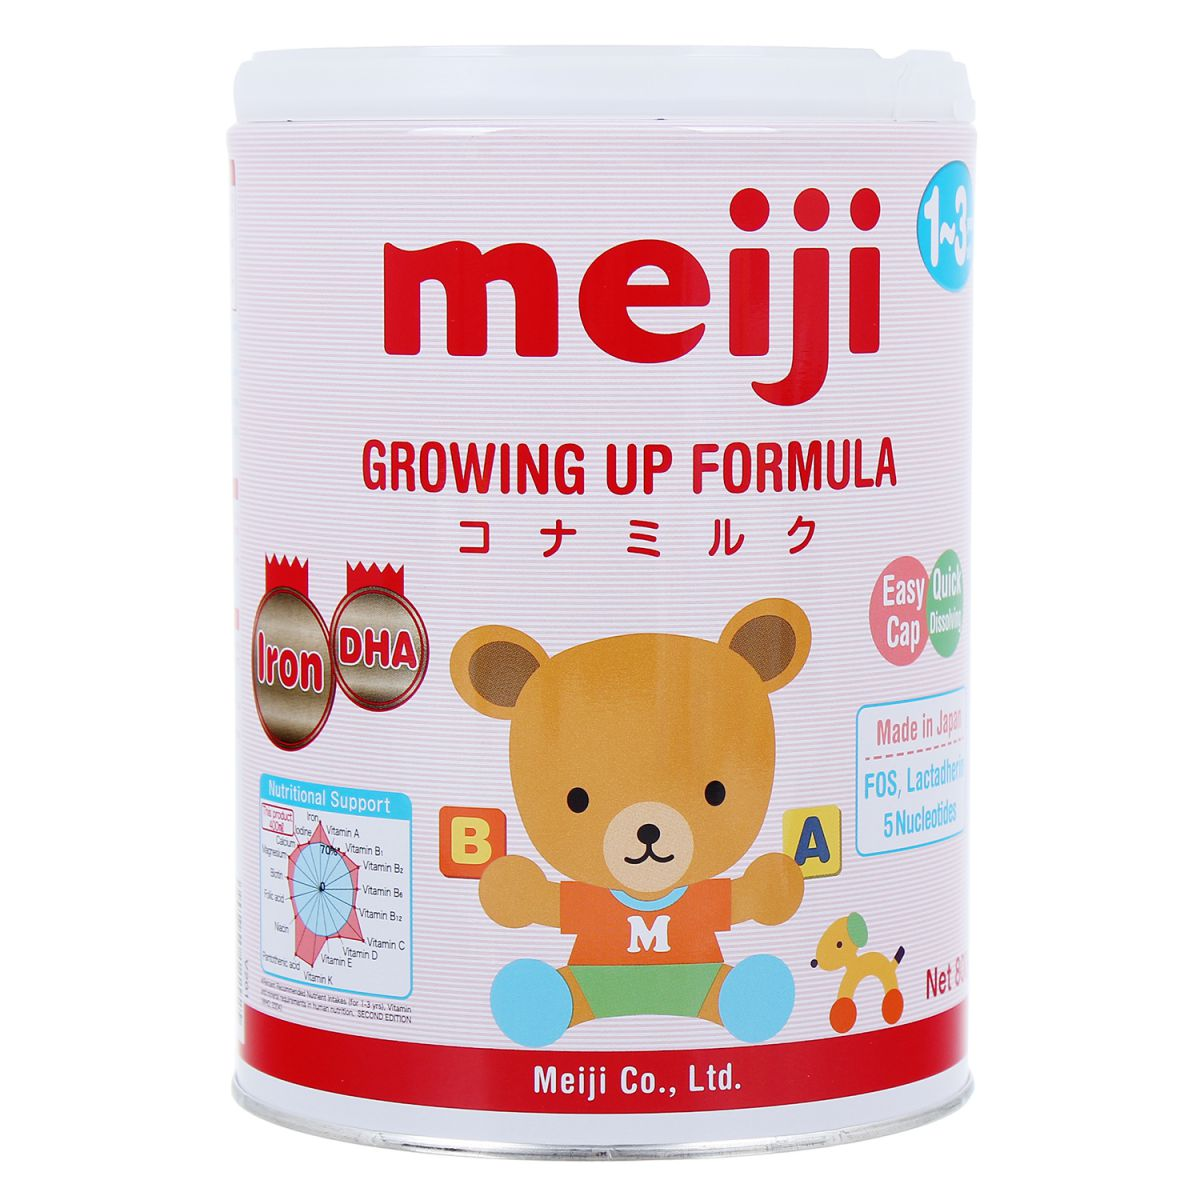 Sữa Meiji Growing Up Formula 800g số 9 (1 - 3 tuổi)